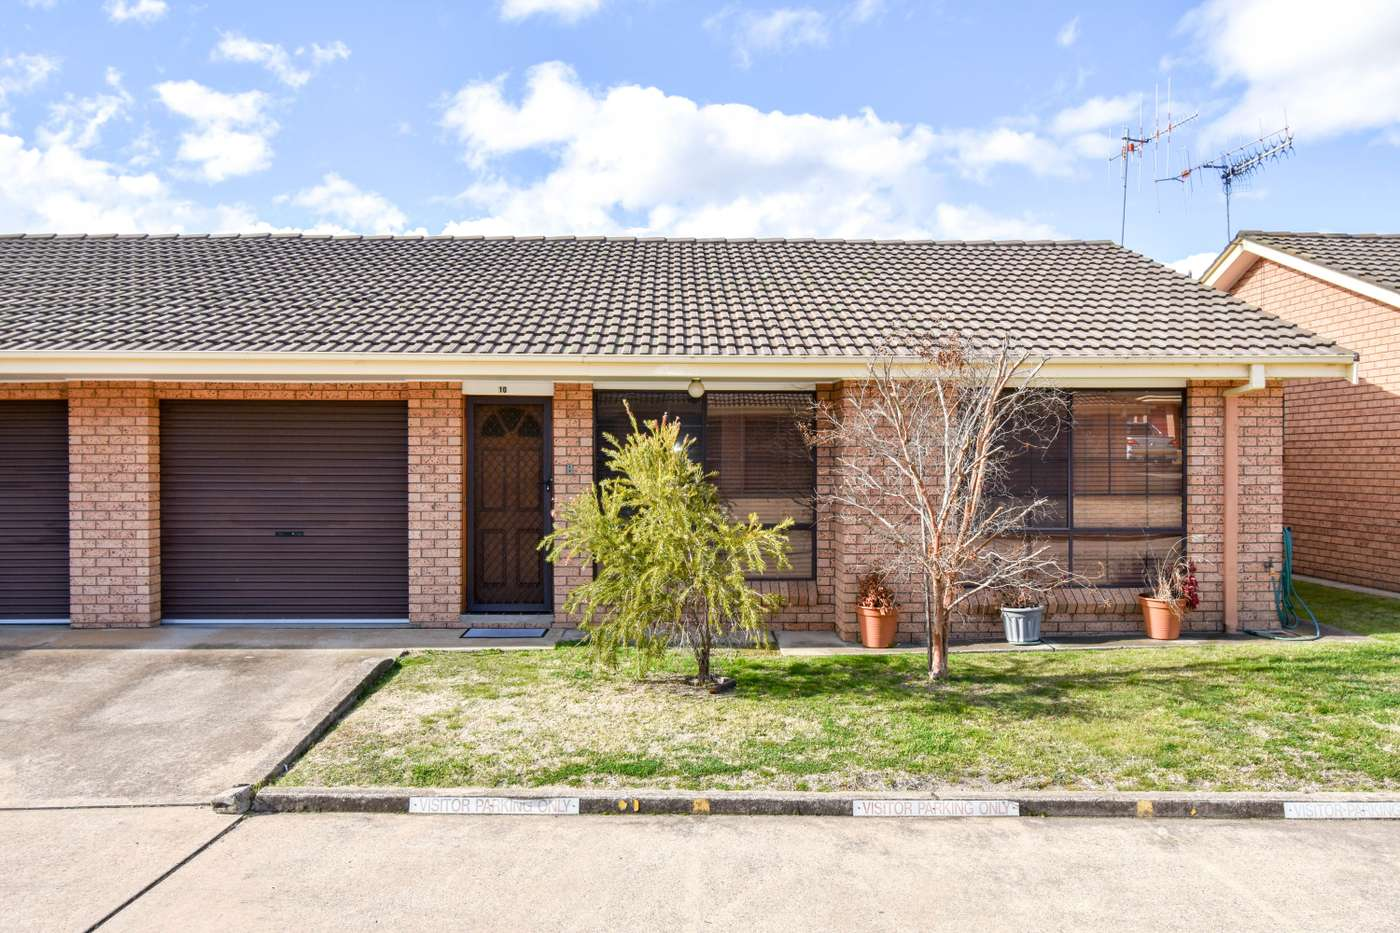 Main view of Homely house listing, 10/185 Lambert Street, Bathurst, NSW 2795